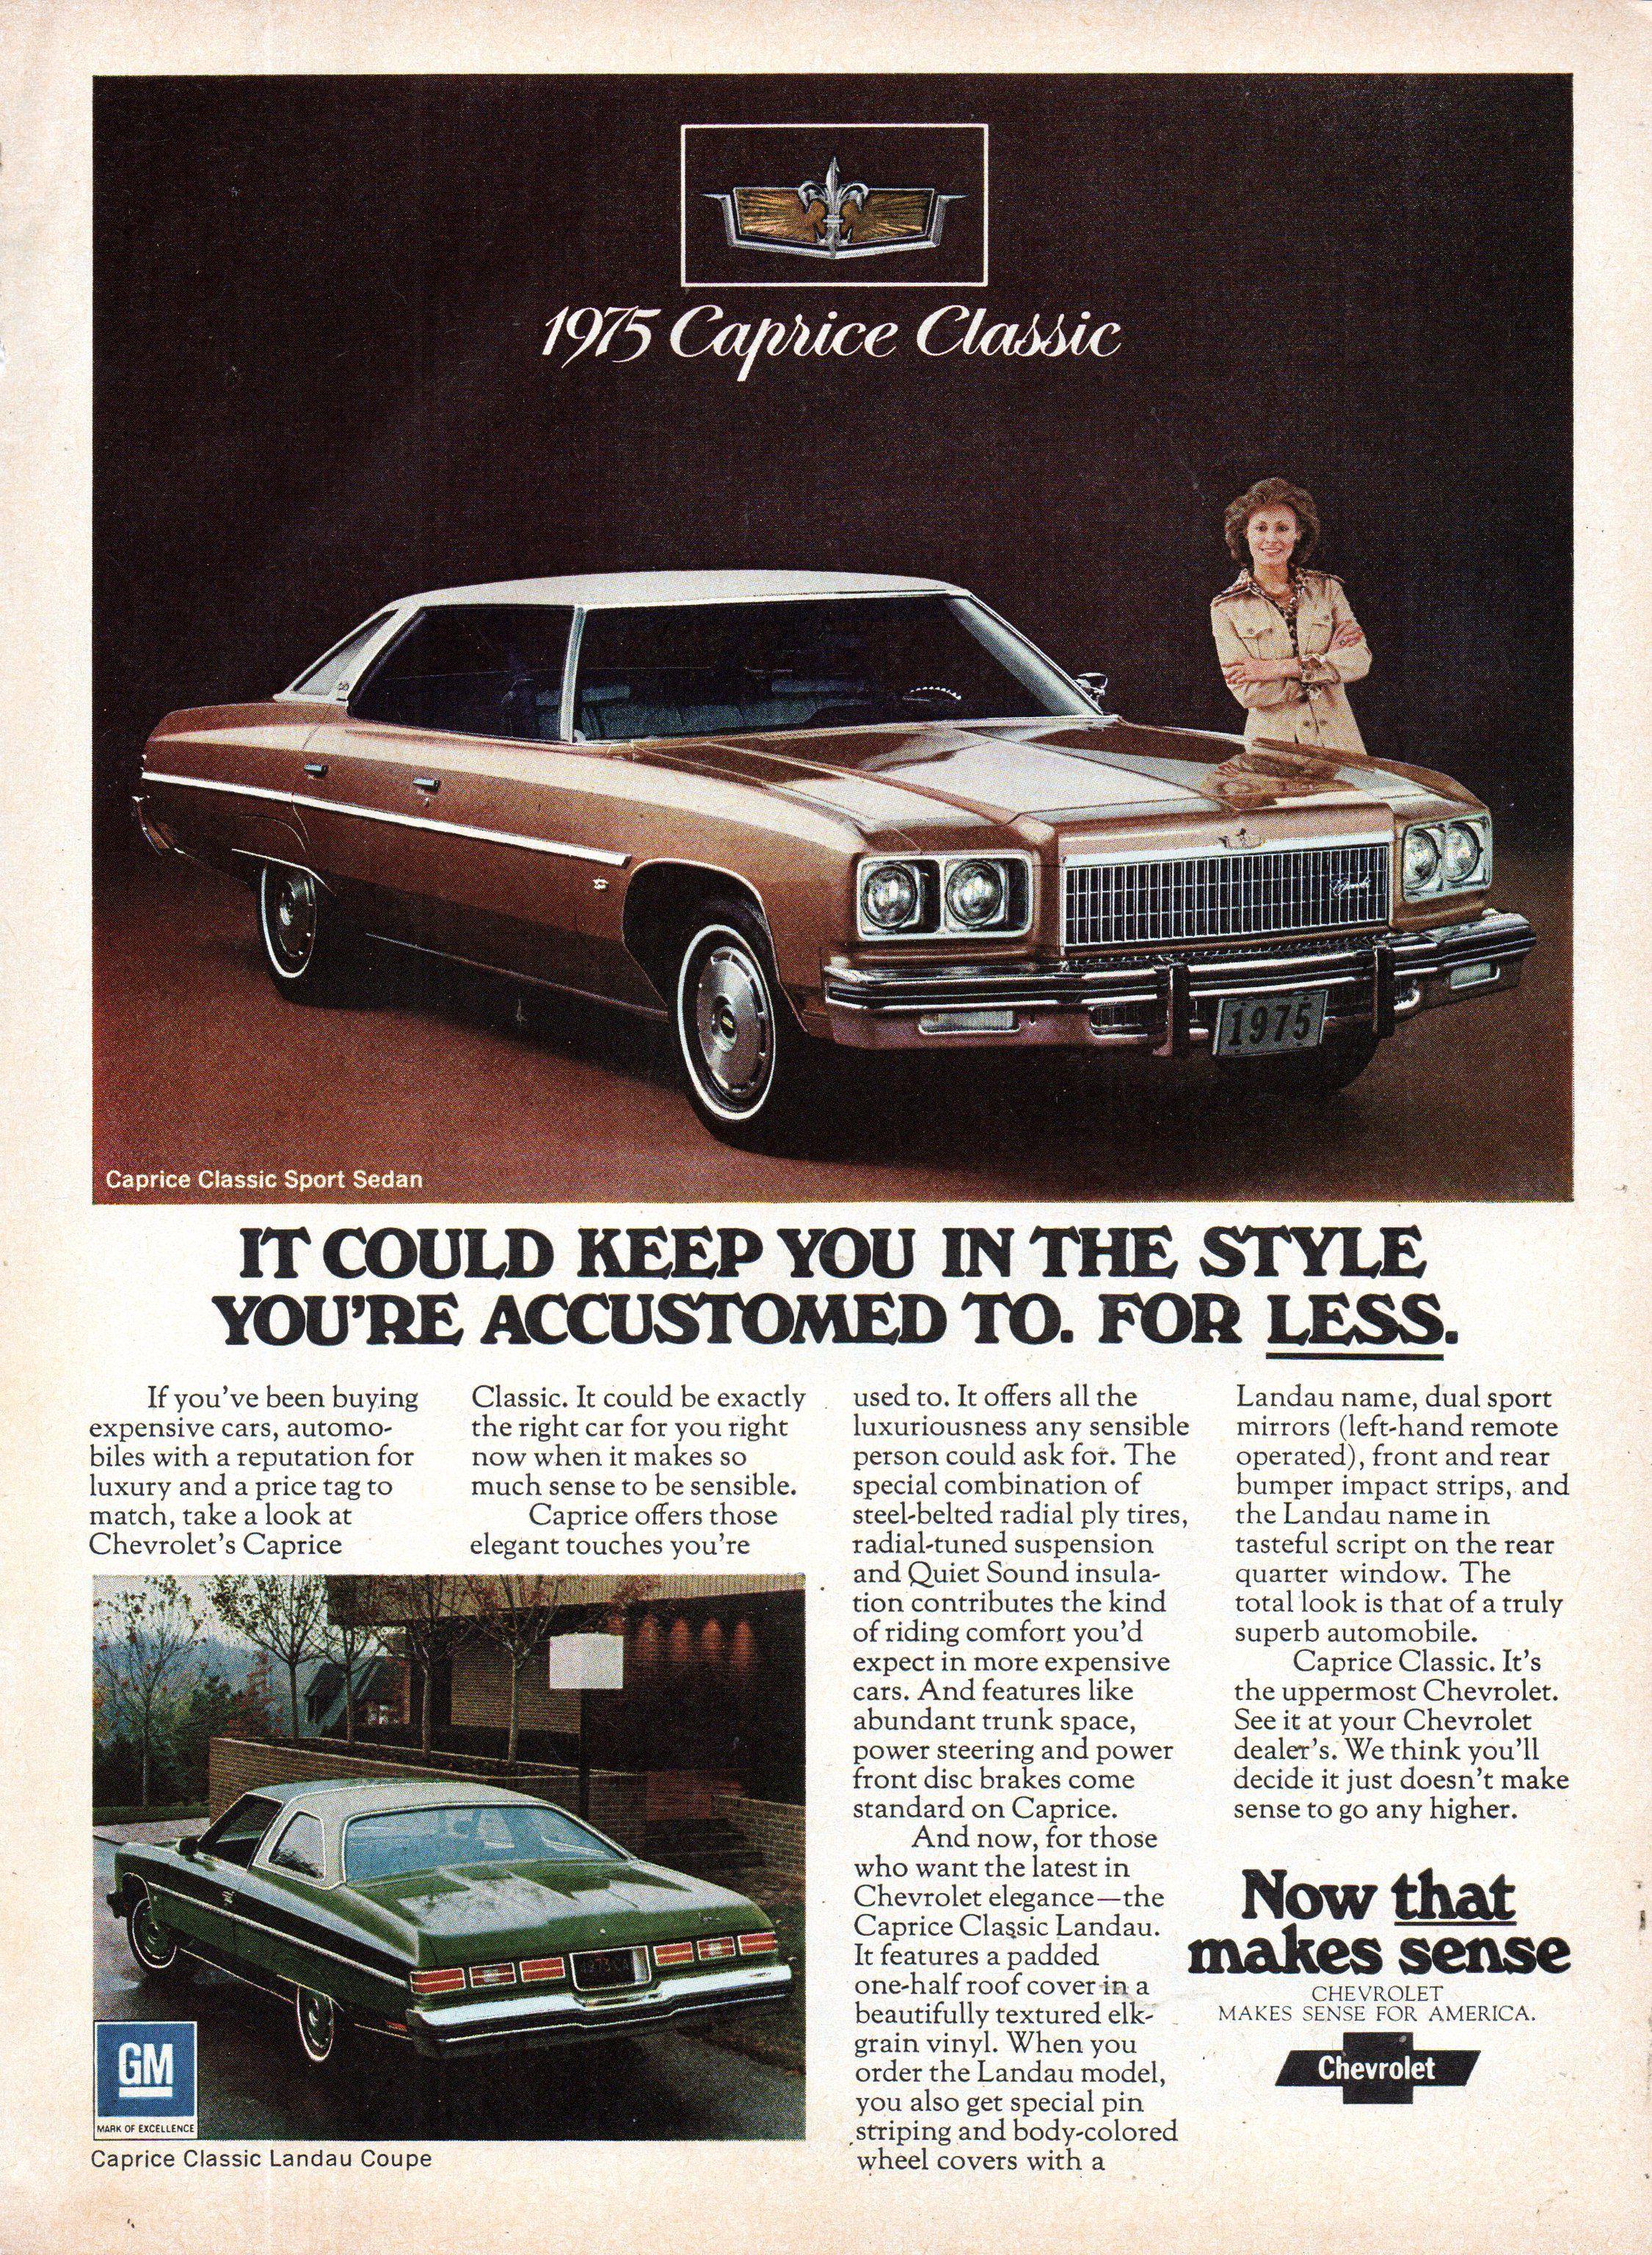 1975 Chevrolet Caprice Classic Sport Sedan Chevrolet Caprice Classic Landau Coupe Usa Original Magazine Adve In 2020 Caprice Classic American Classic Cars Sedan Cars